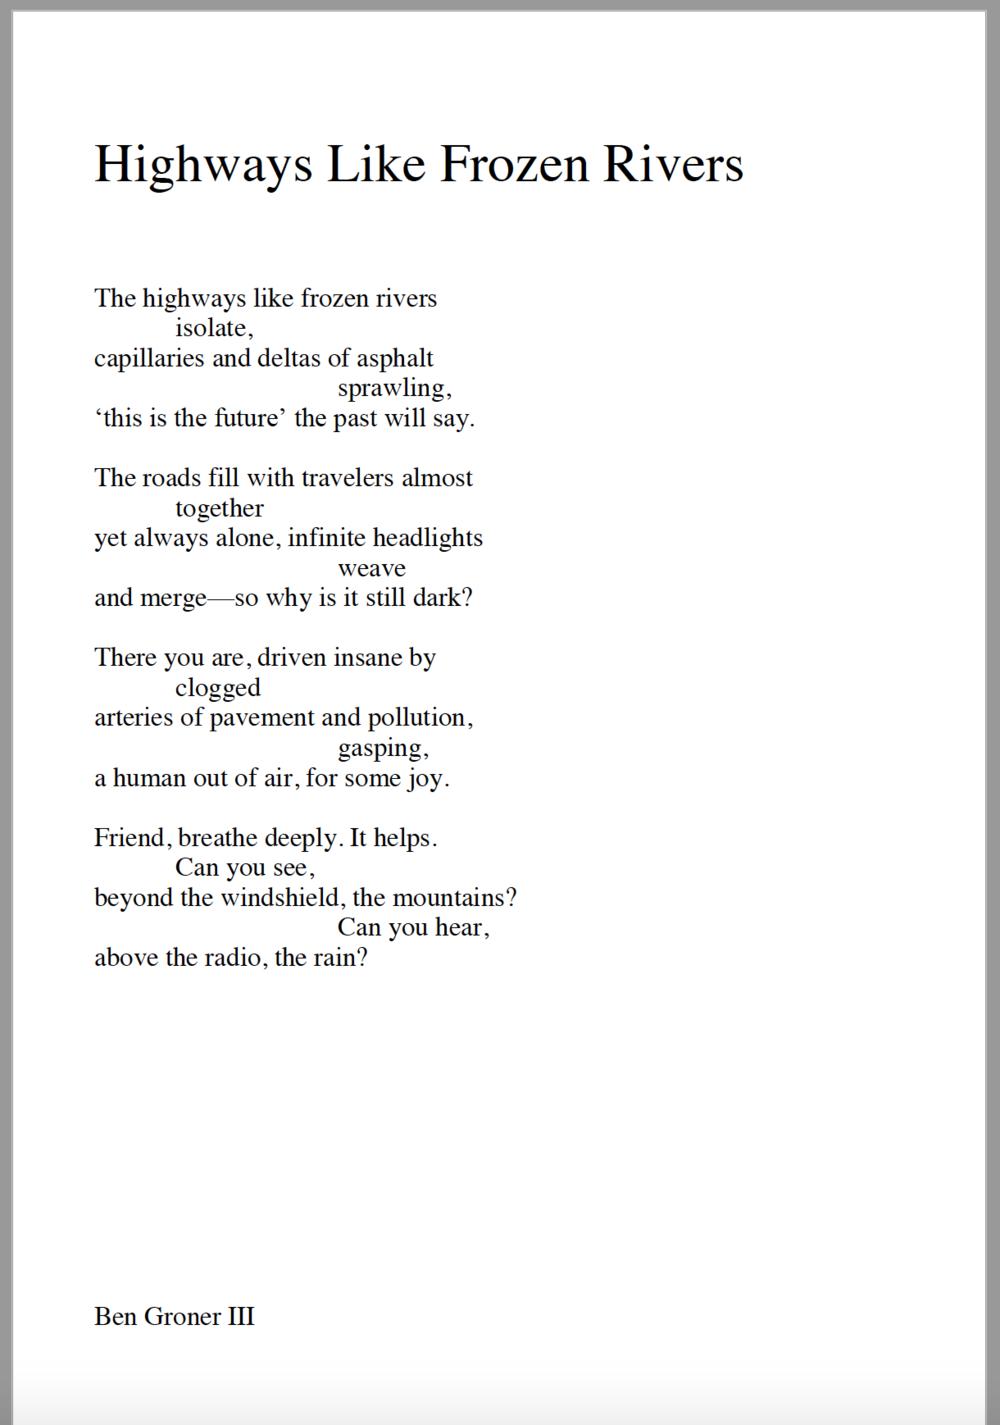 Highways Like Frozen Rivers PDF screenshot 2.png